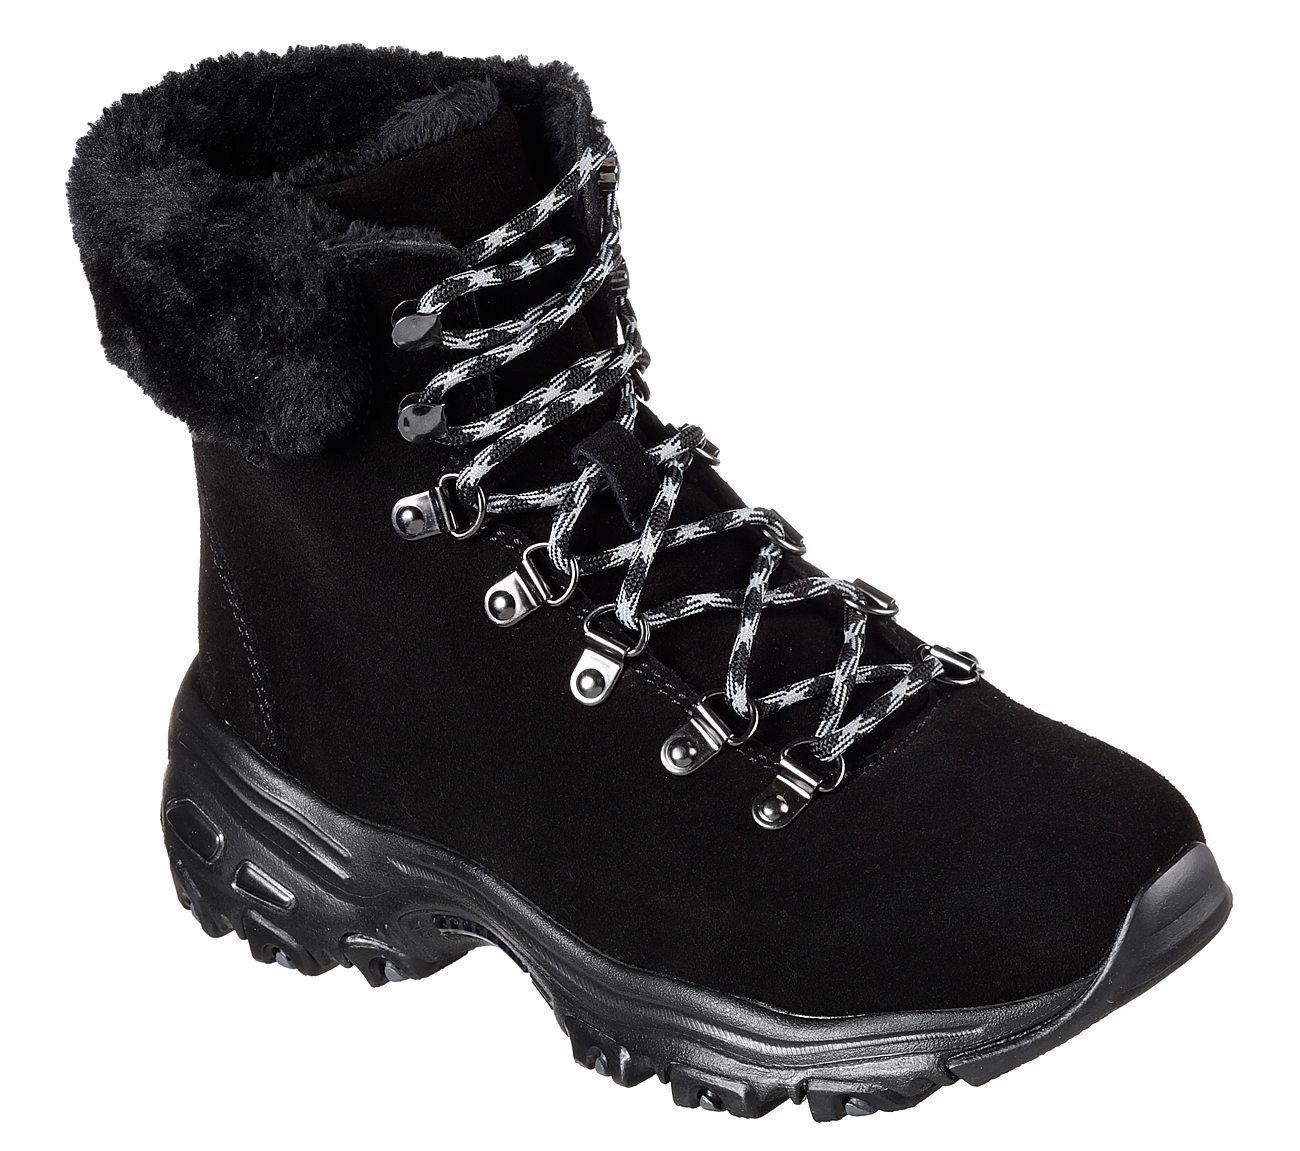 Nuevo Skechers señora señora señora botas d 'Lites-Alps negro d38e63